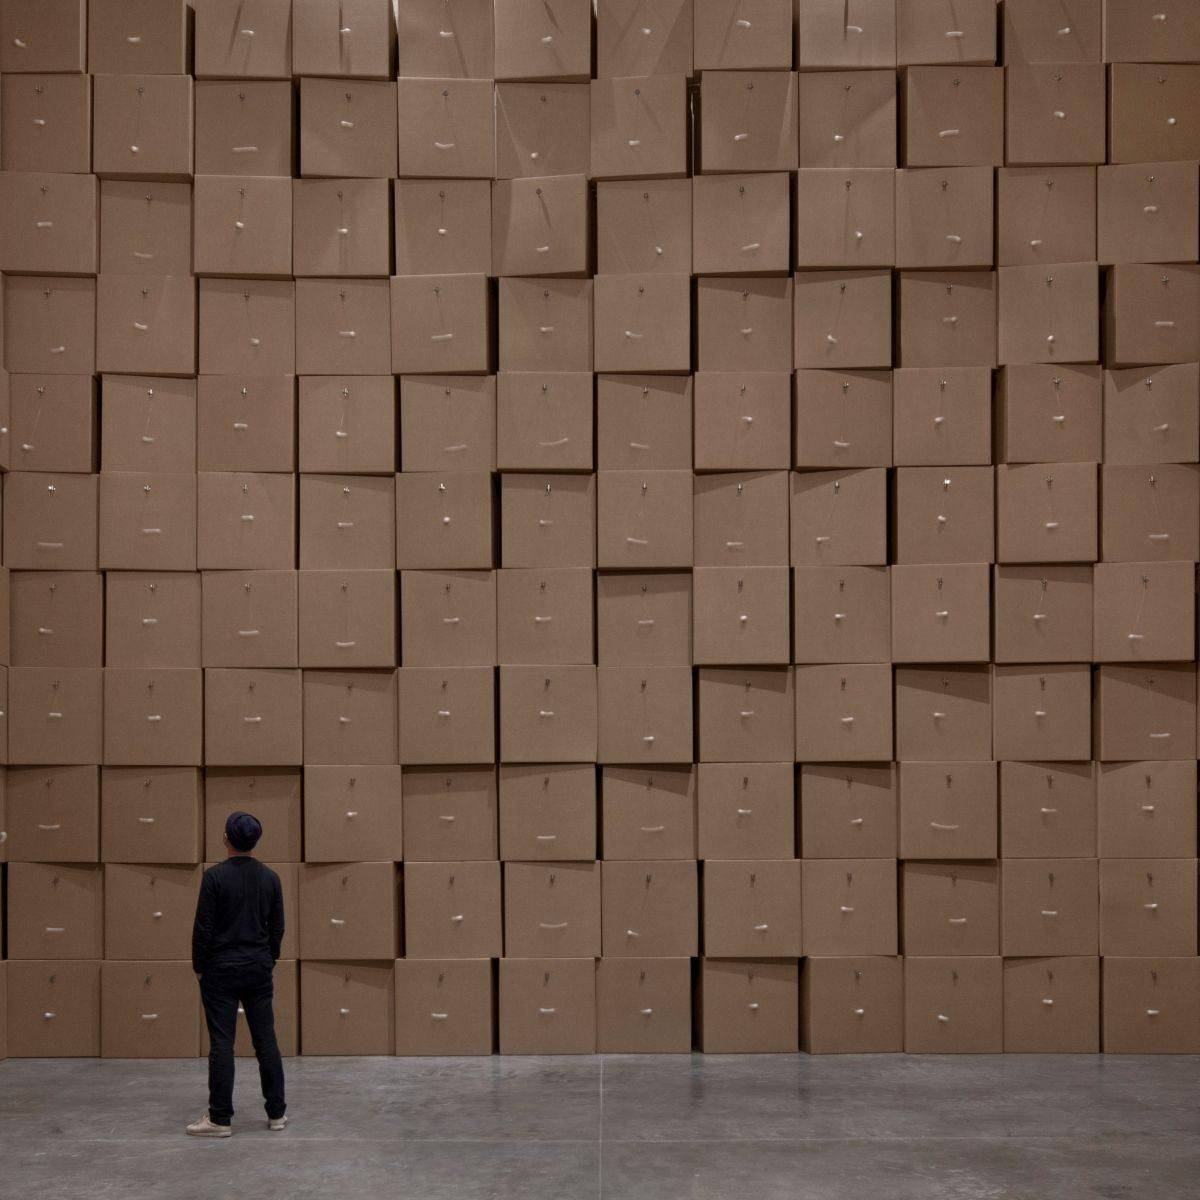 c.-3_zimoun_-216-prepared-dc-motors-cotton-balls-cardboard-boxes-70x70x70cm-hauch-gallery-1200x1200.jpg